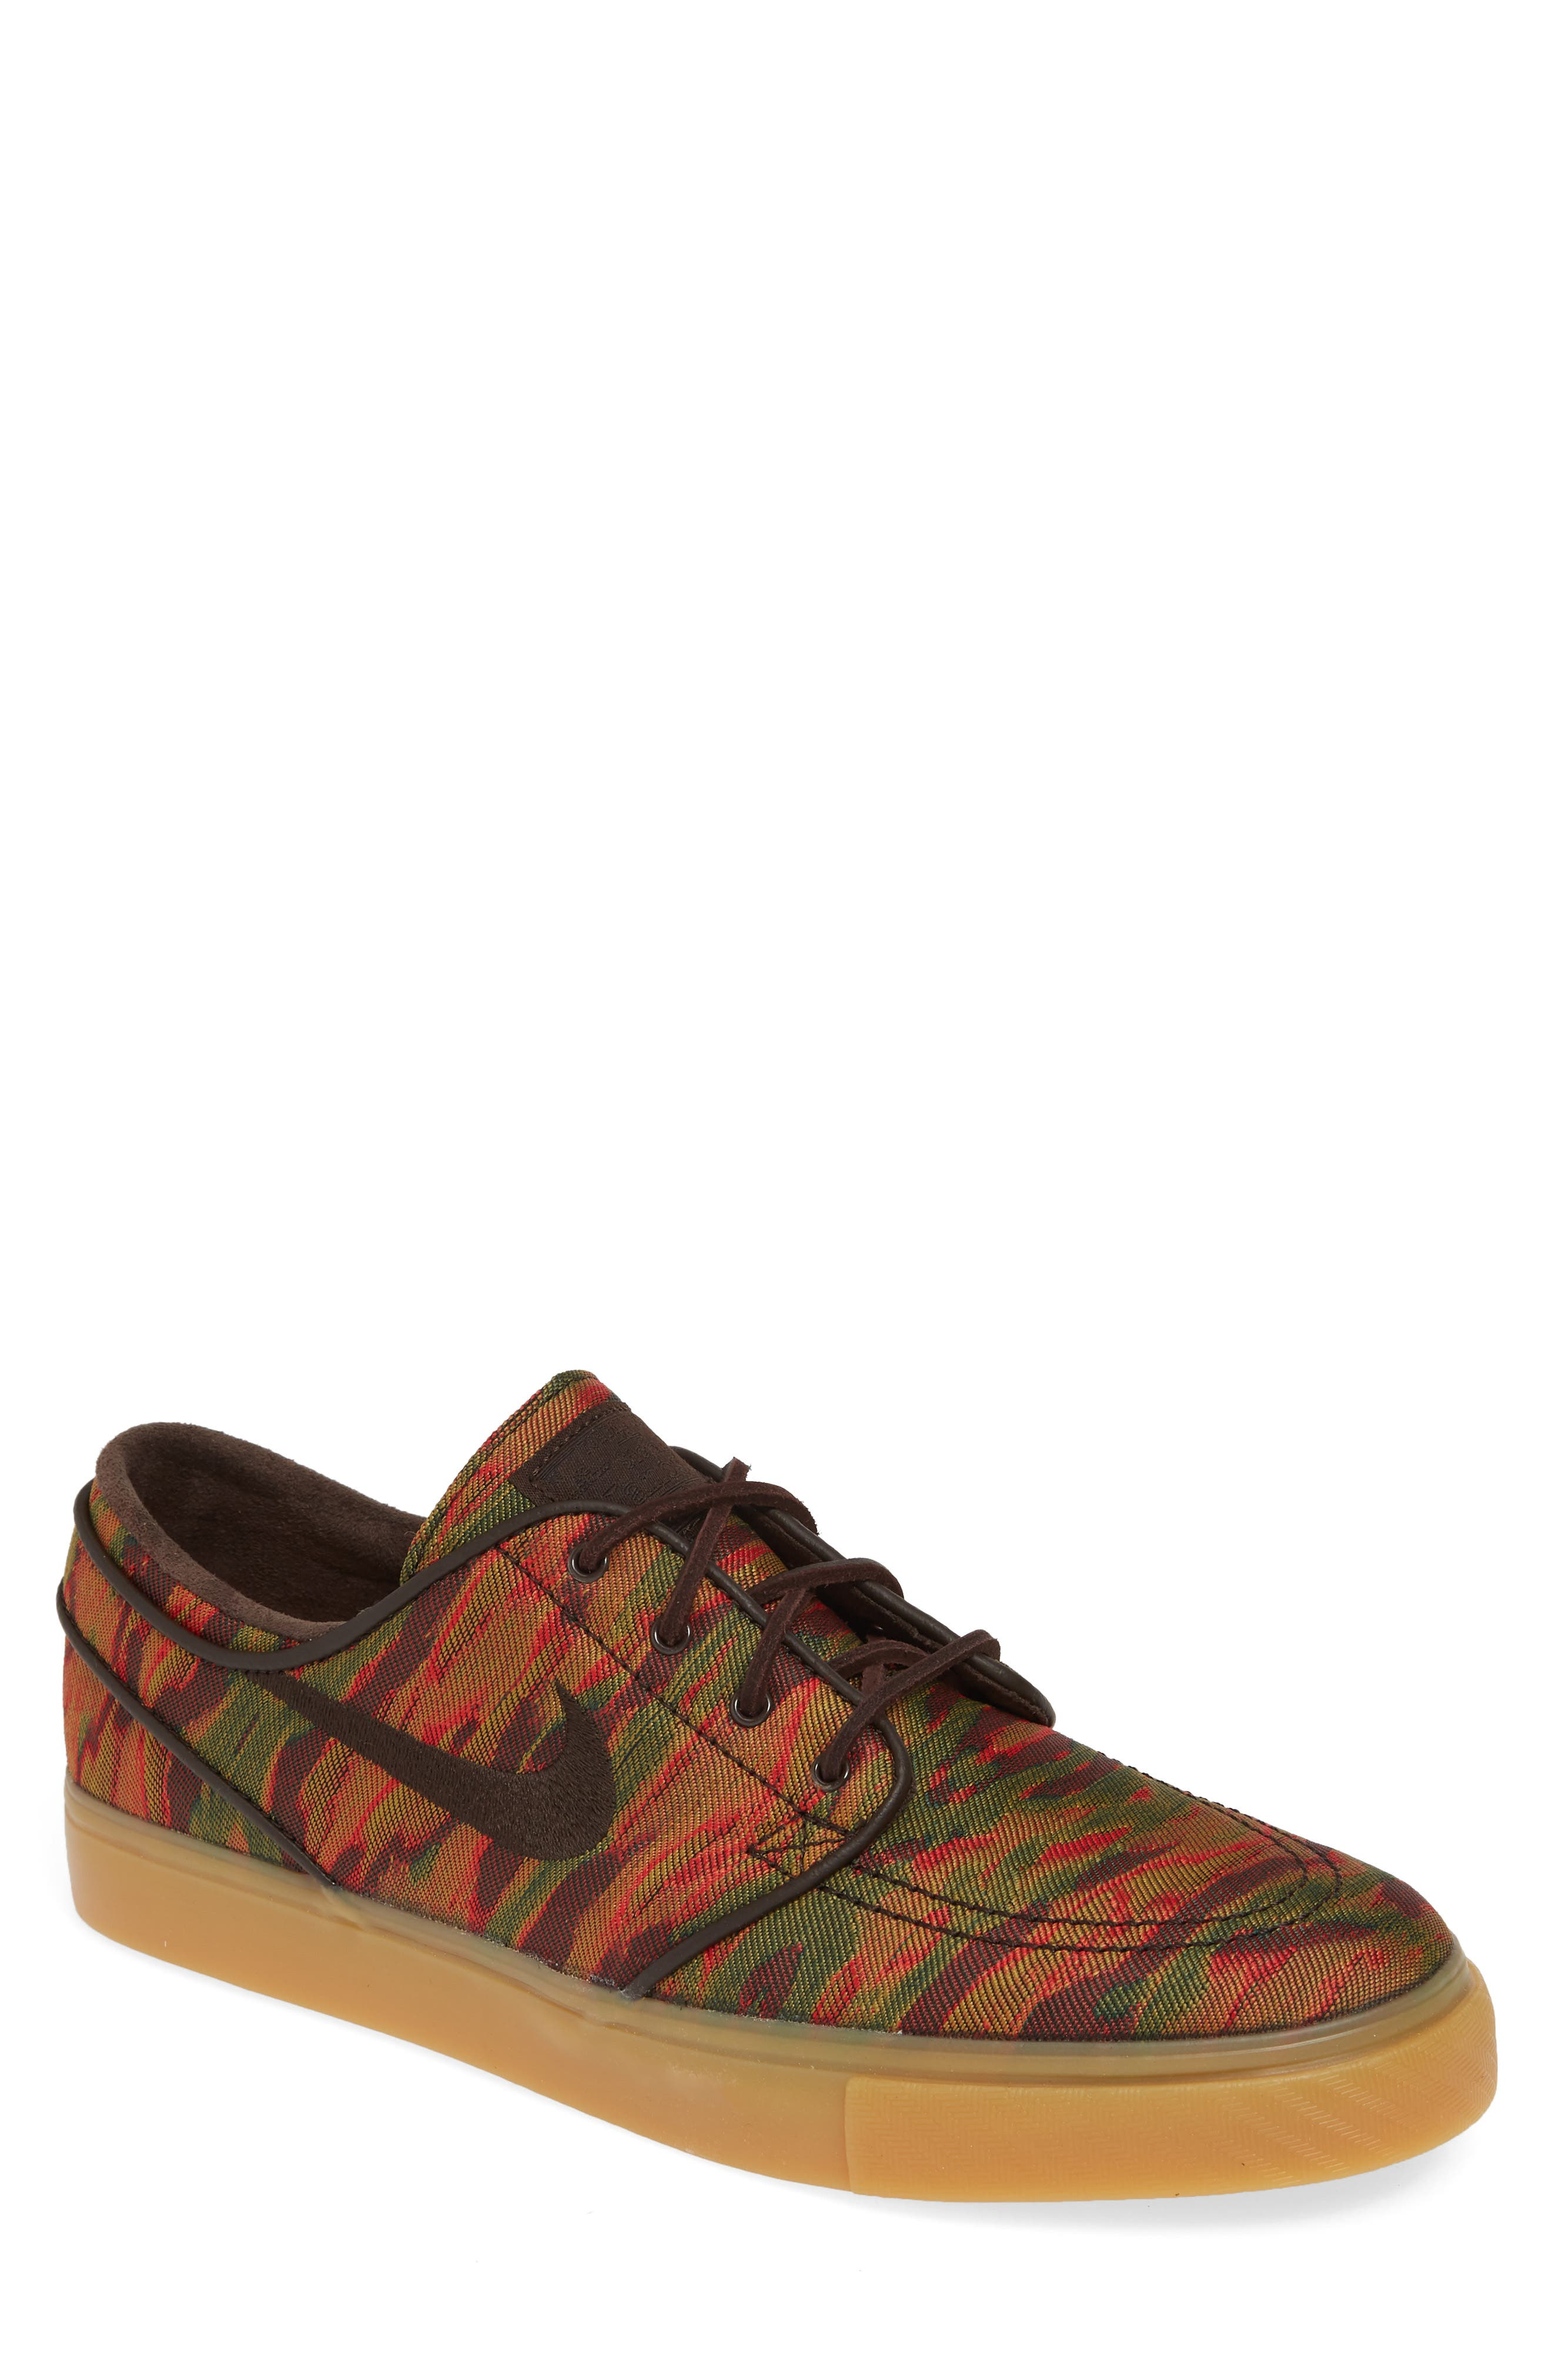 150dcf42fcea Nike  Zoom Stefan Janoski Sb  Skate Shoe- Brown